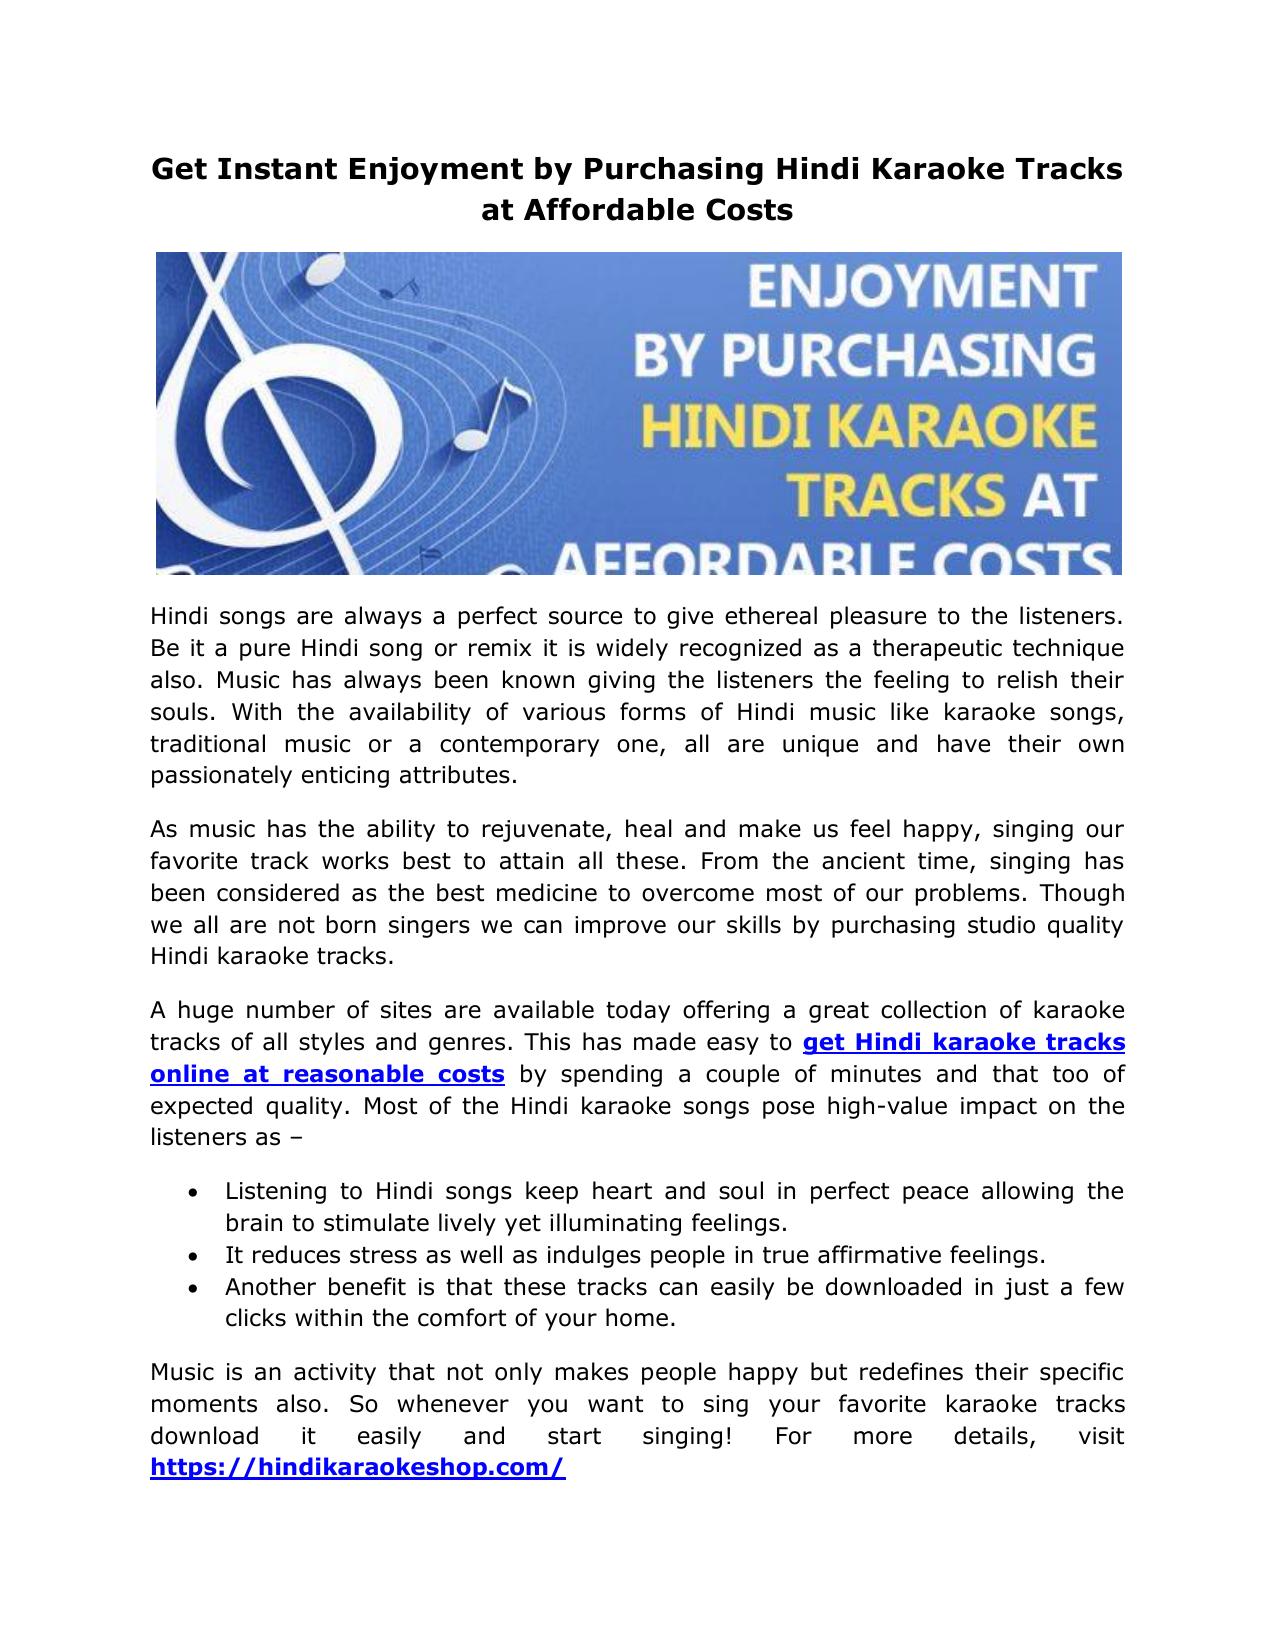 Get Instant Enjoyment By Purchasing Hindi Karaoke Tracks At Affordable Costs Kaun tujhe singing lesson bollywood singing lessons/tutorials by mayoor. studylib